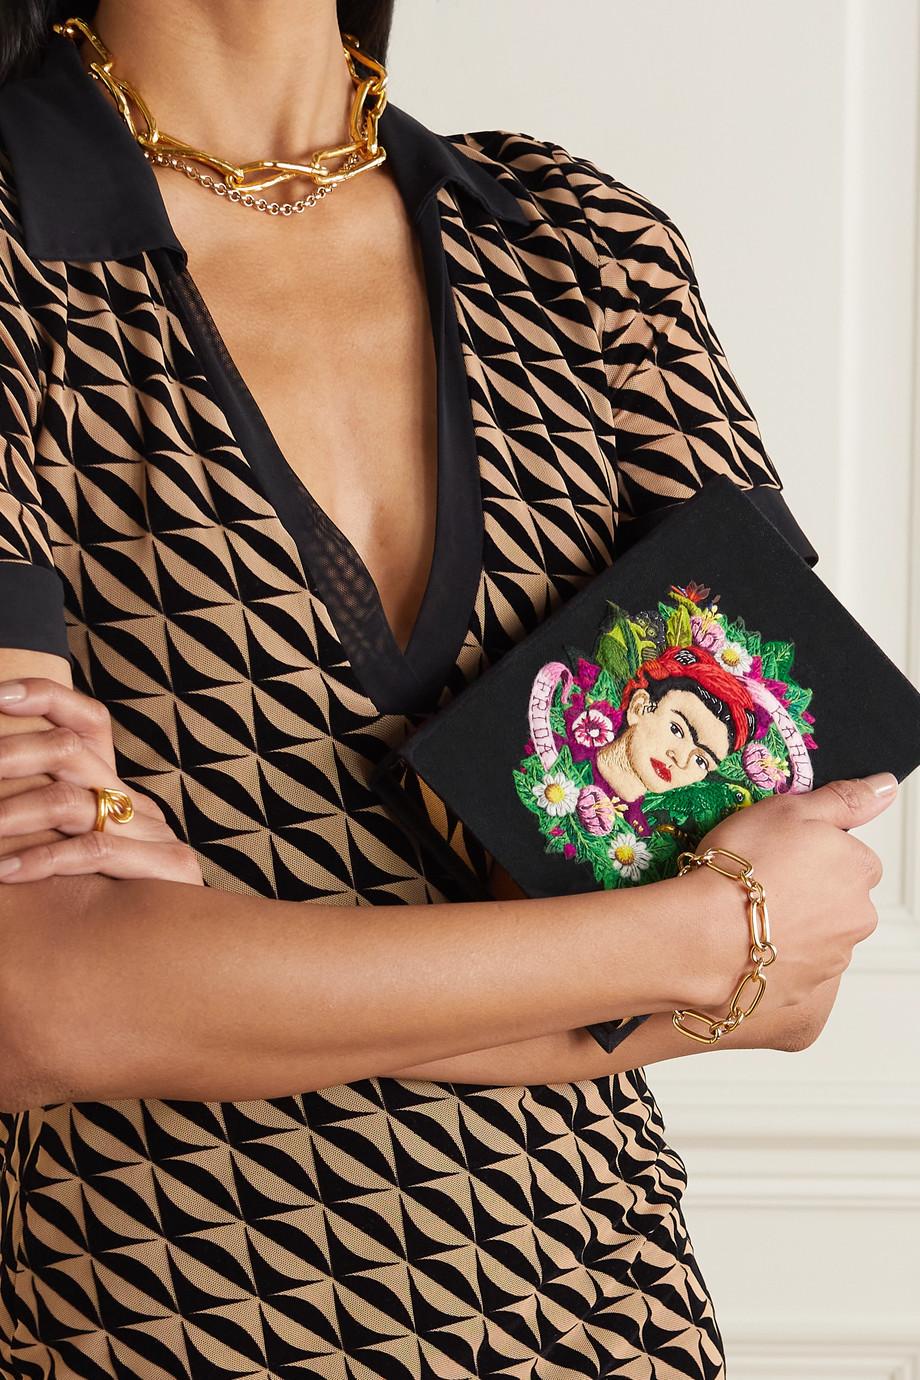 Olympia Le-Tan Frida Kahlo embroidered appliquéd canvas clutch